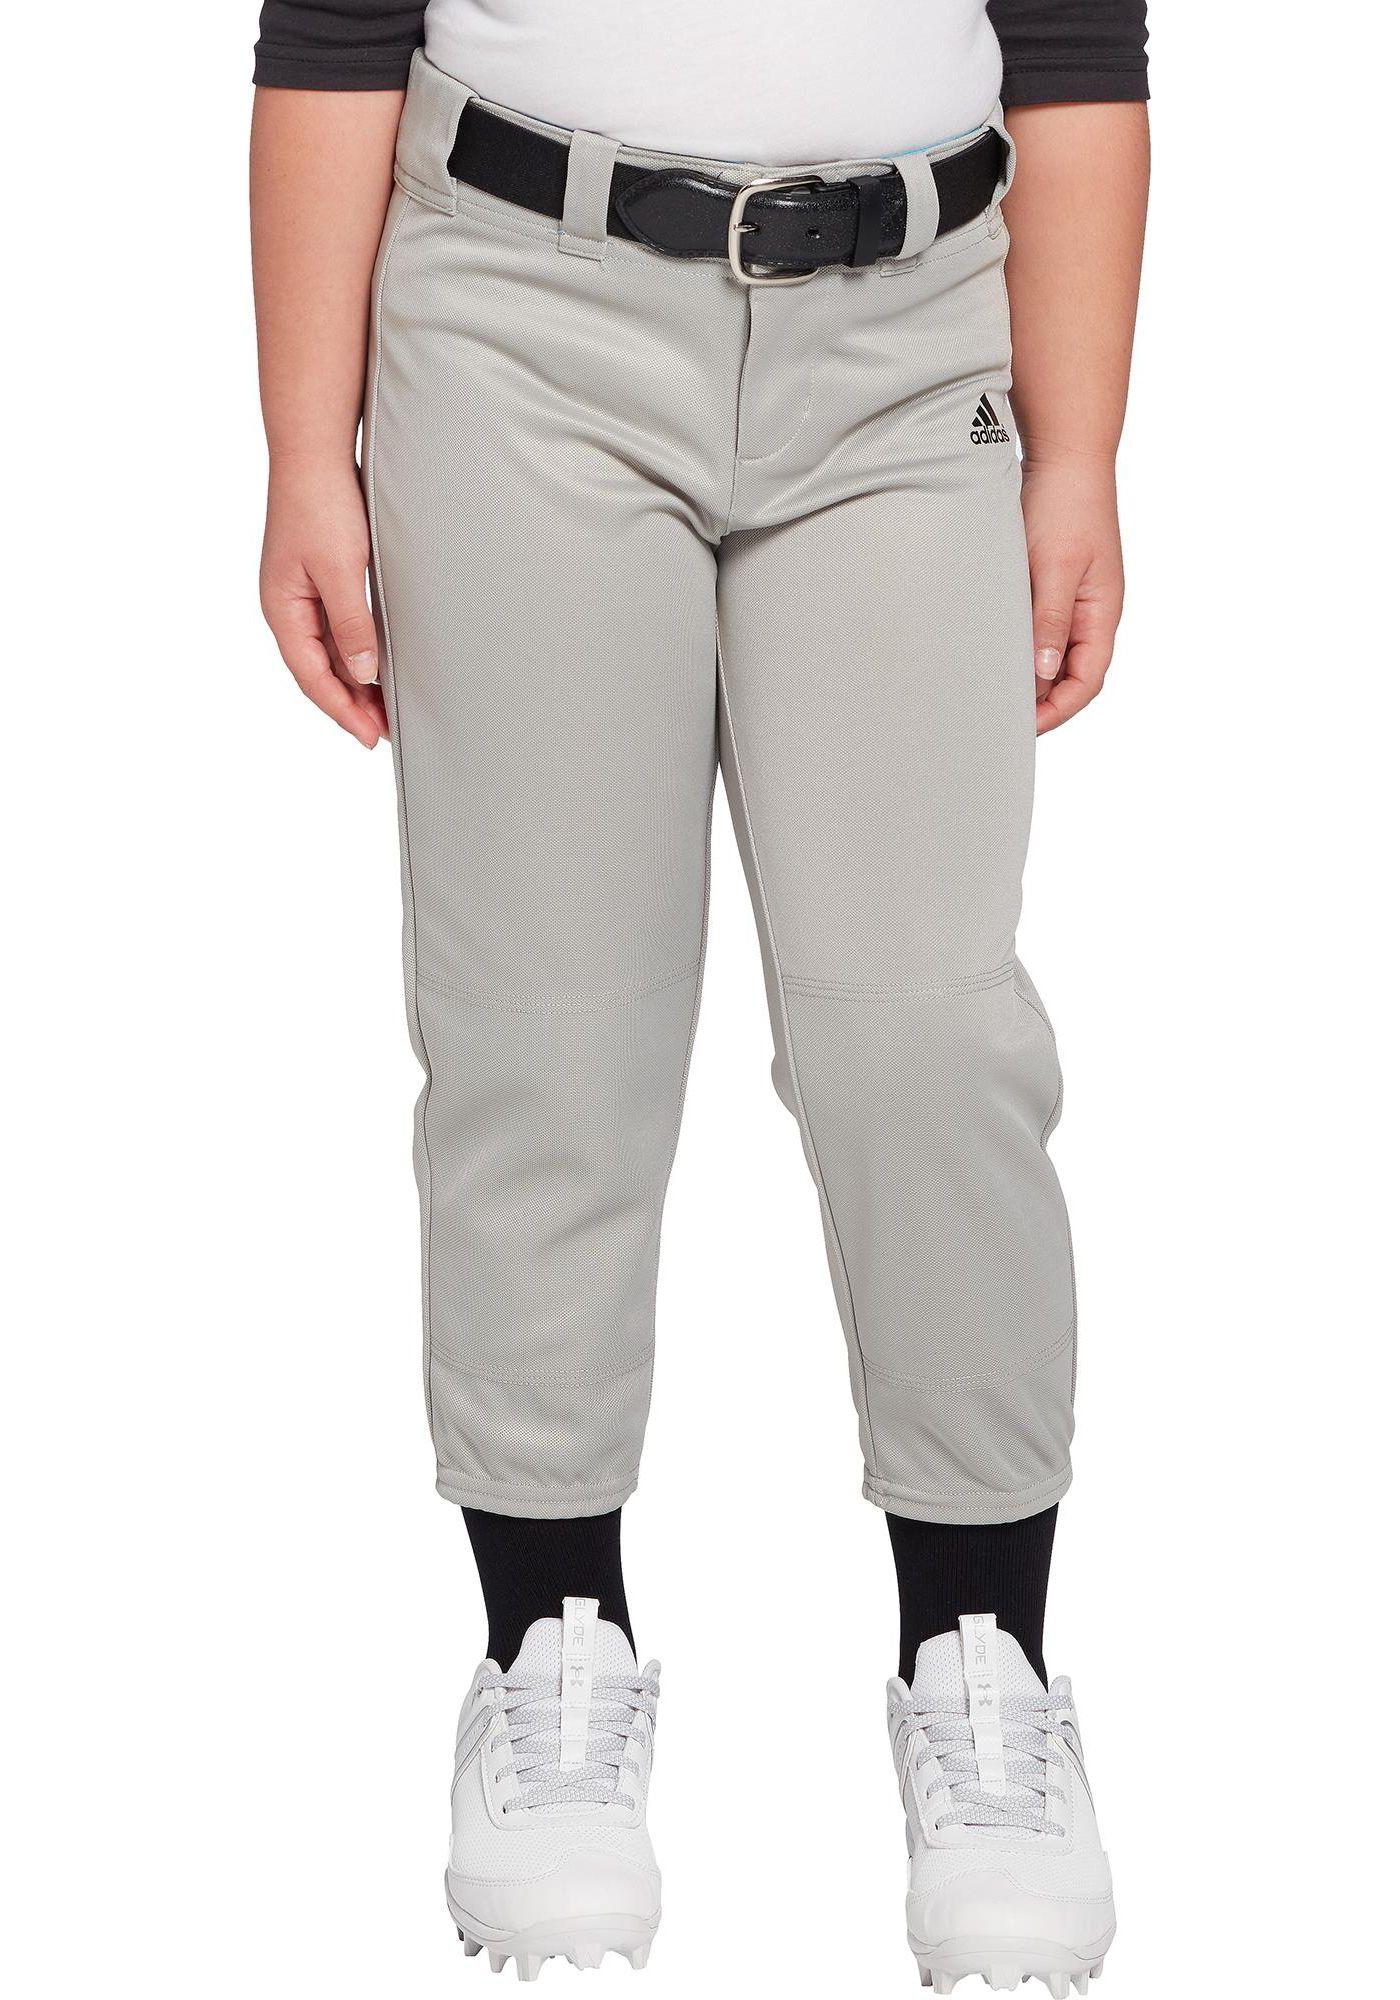 adidas Girls' Destiny Softball Pants